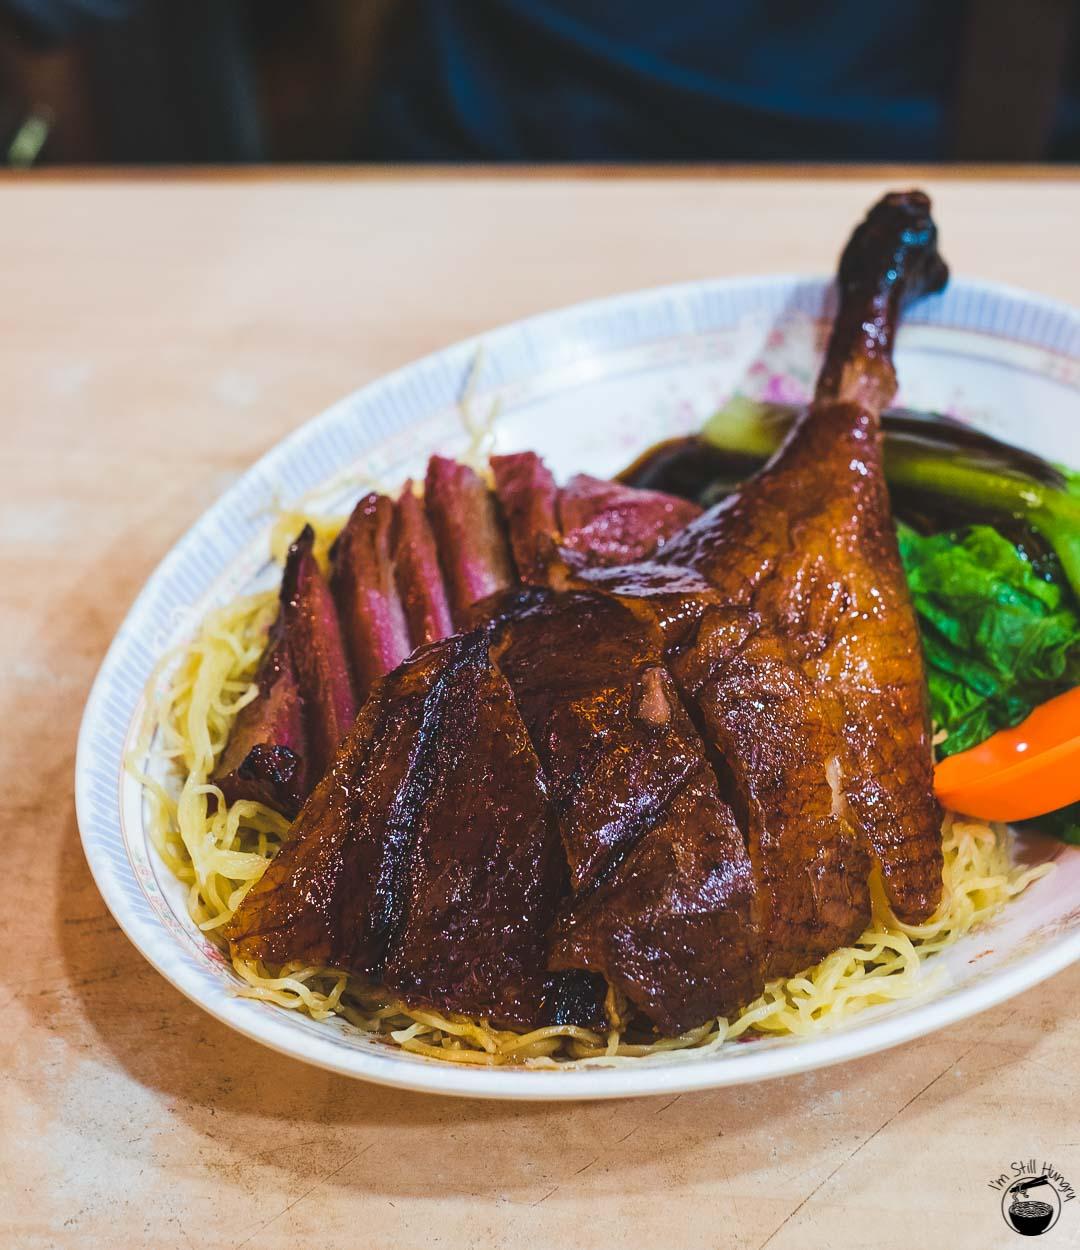 Yat Lok Roast Goose Hong Kong Roast goose w/BBQ pork + veg set